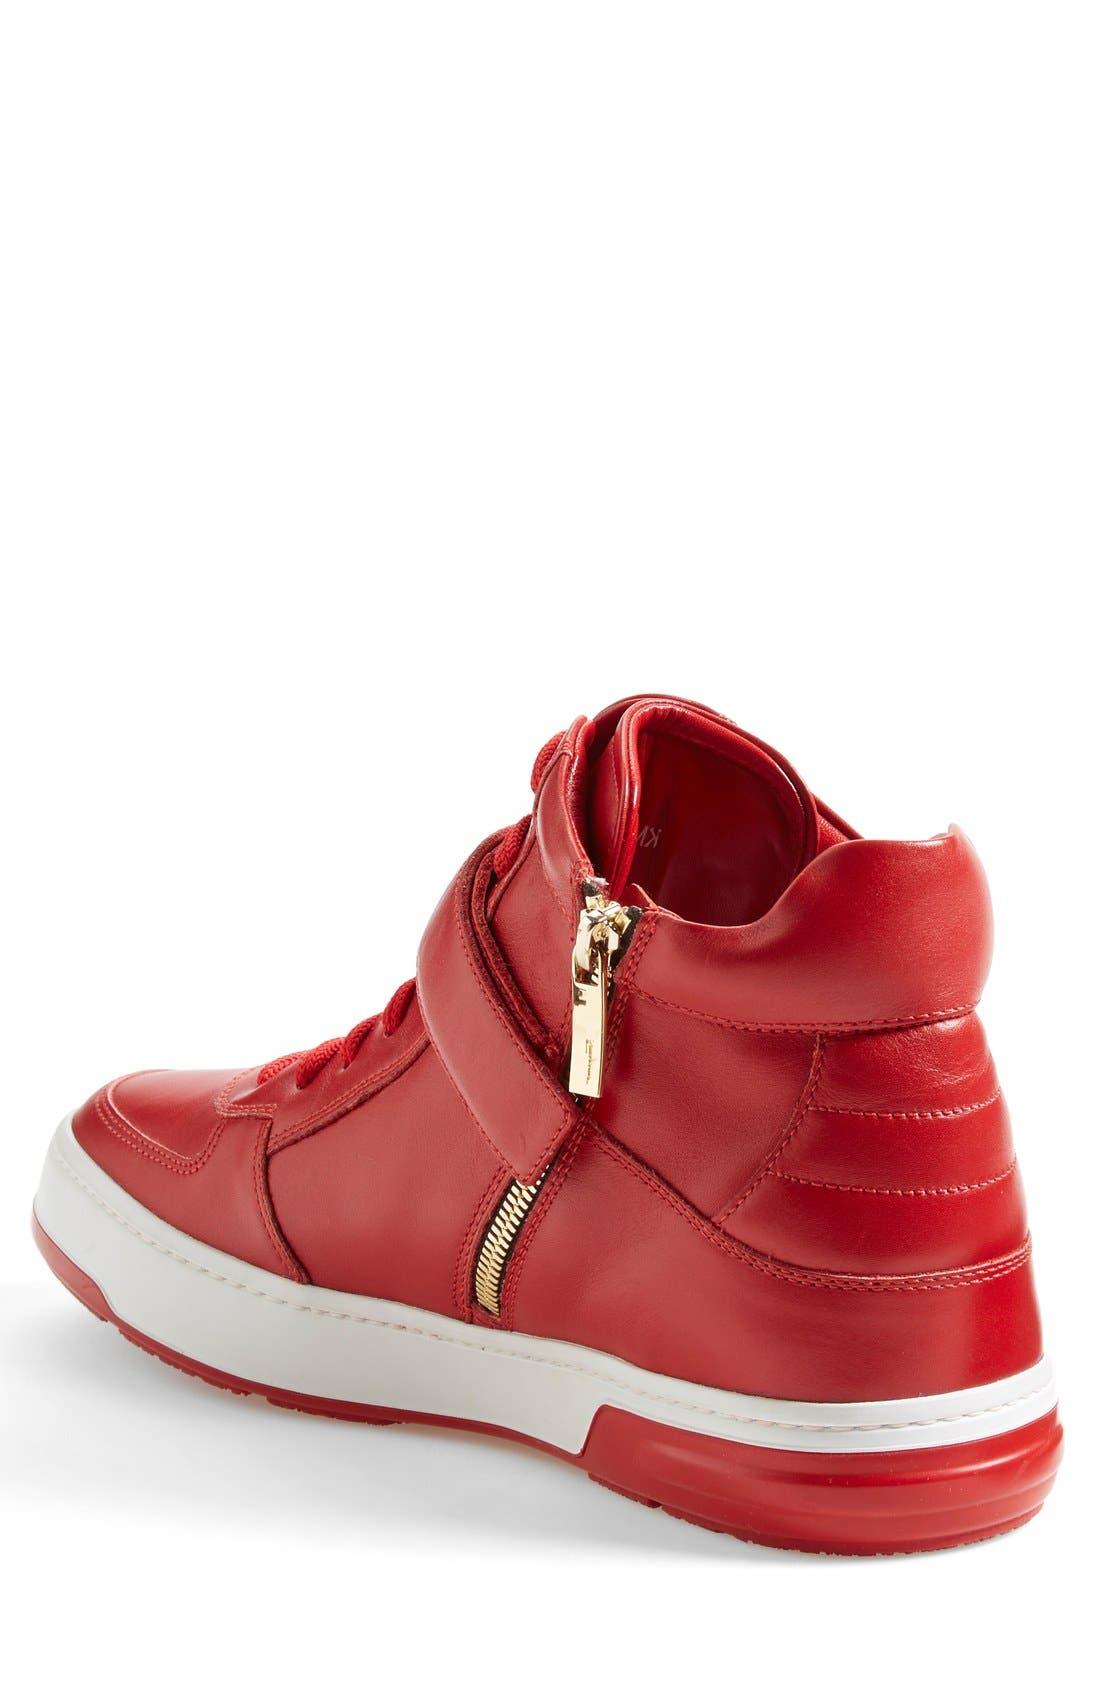 Alternate Image 3  - Salvatore Ferragamo 'Nayon' High Top Sneaker (Men)